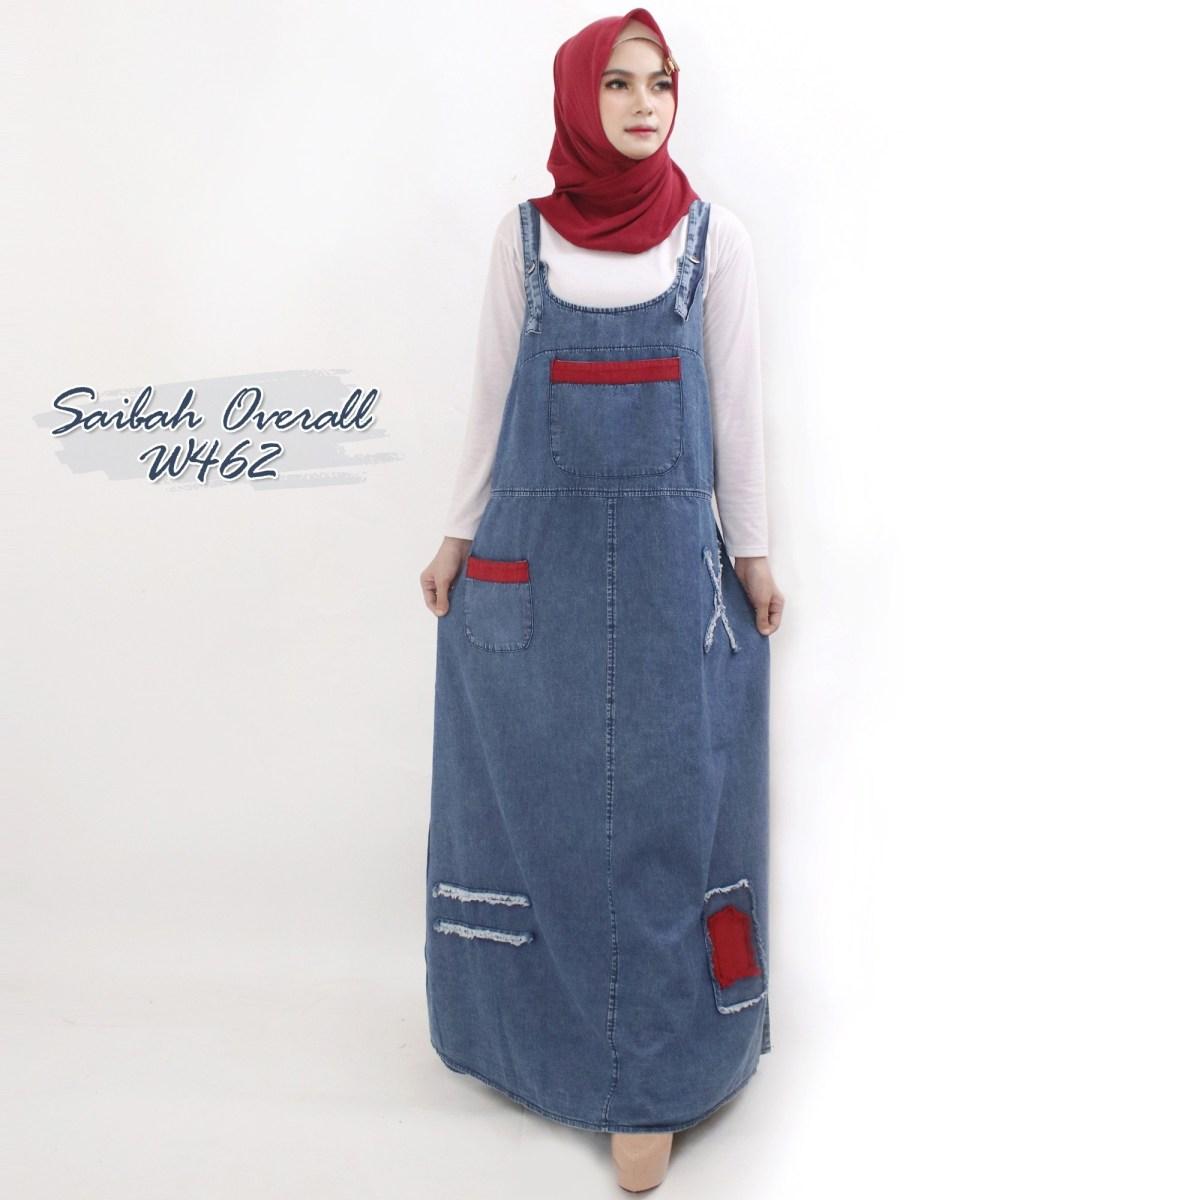 saibah overall w462 baju hijab style ootd